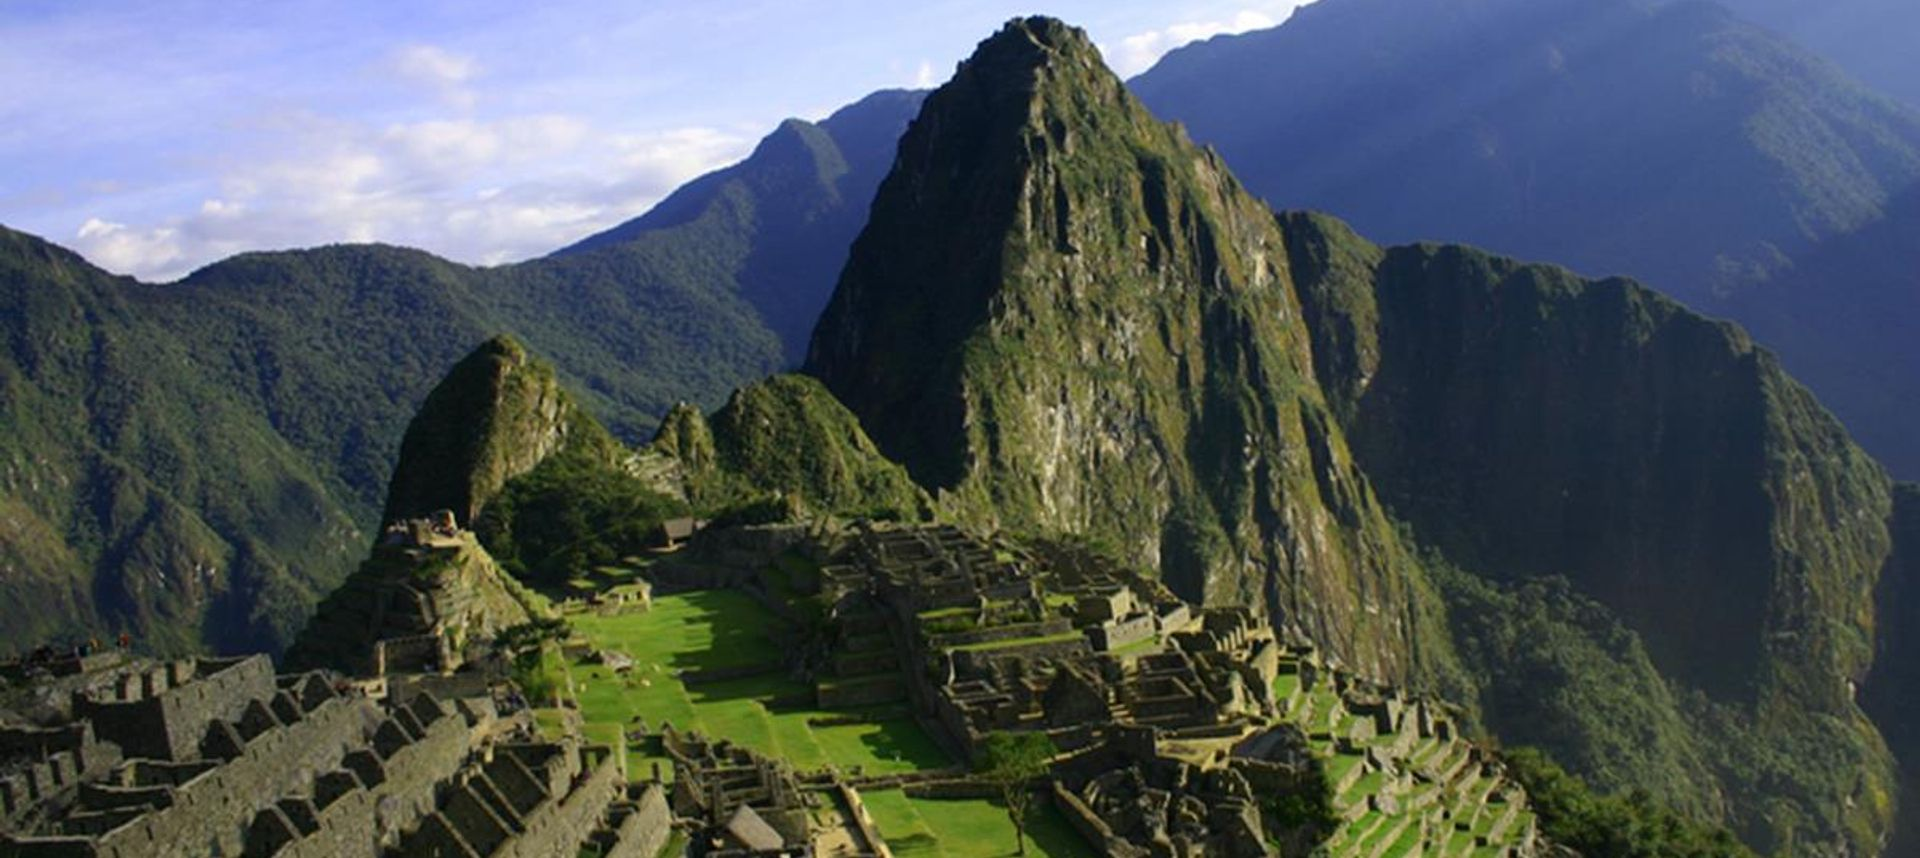 The Inca Trail, Peru leads to the ancient citadel of Machu Picchu (Christian Haugen)